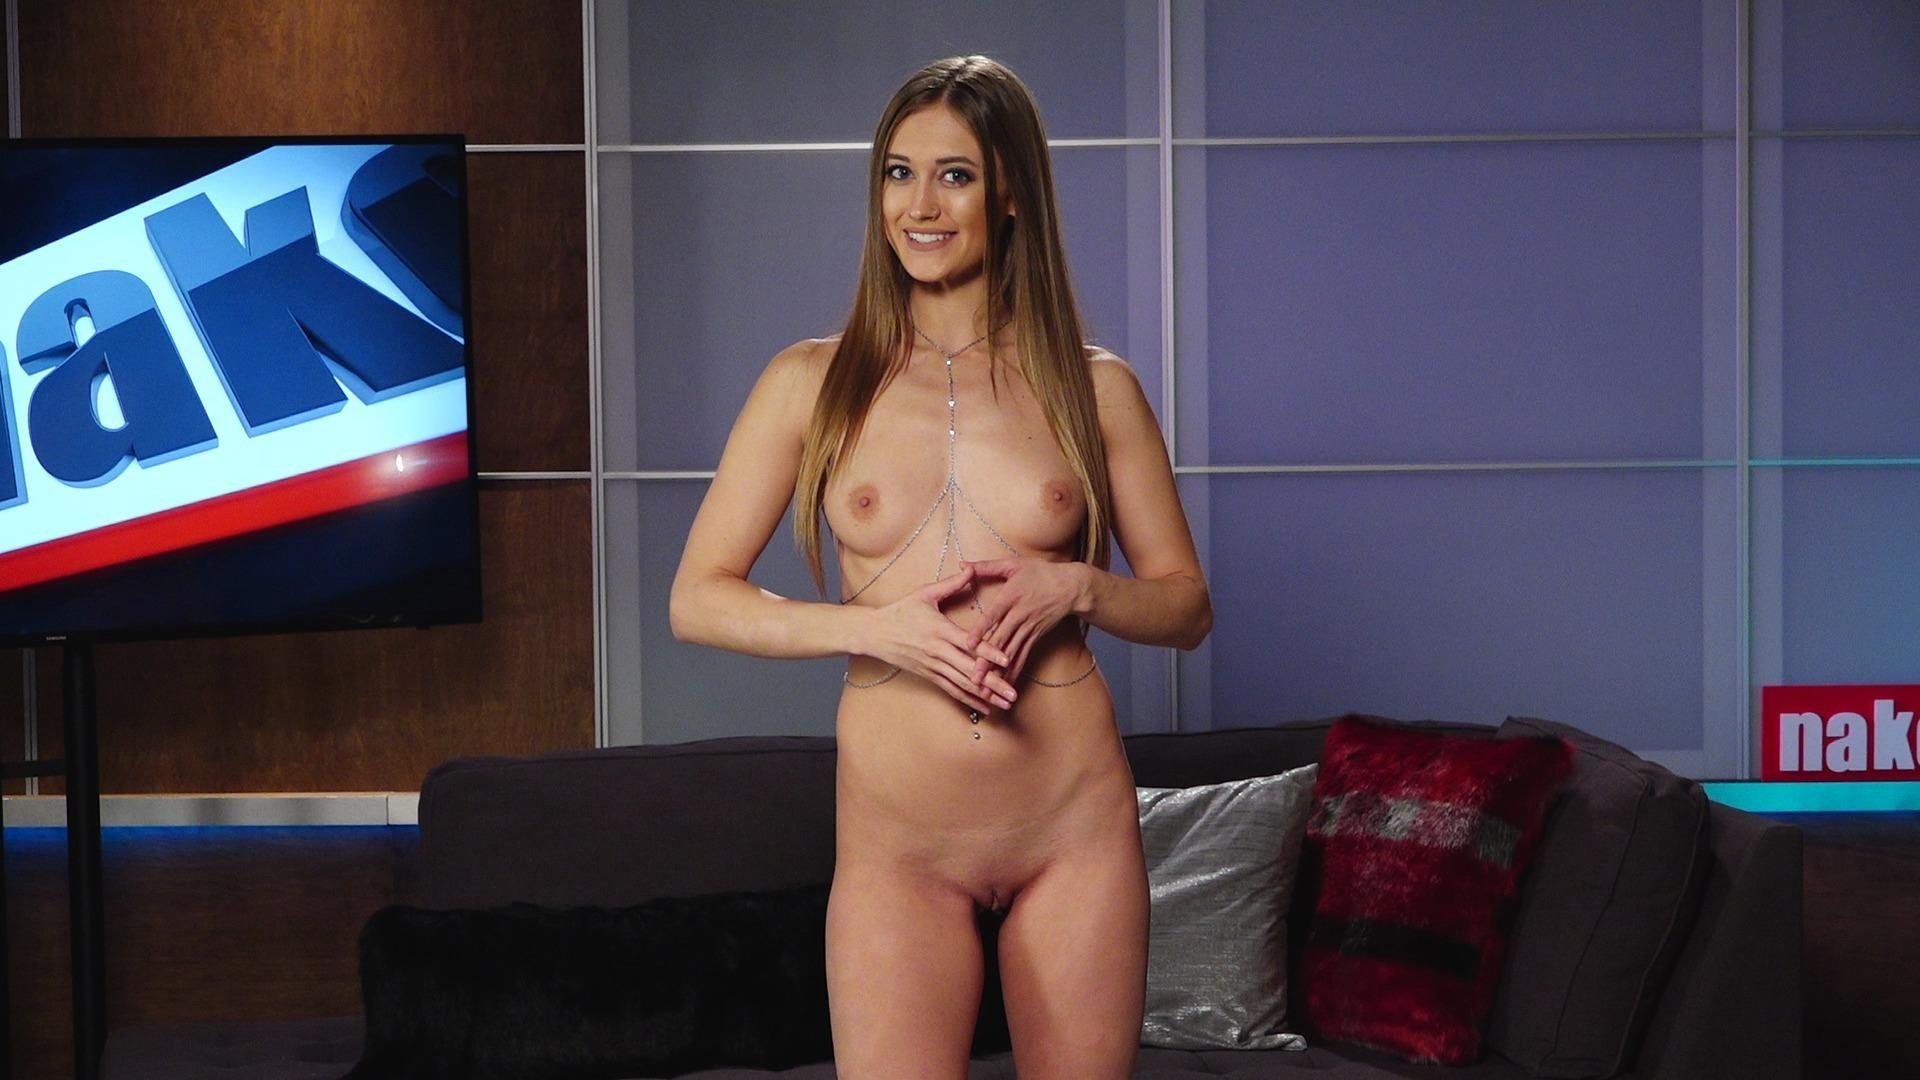 Free internet adult naked personals alexandria alabama